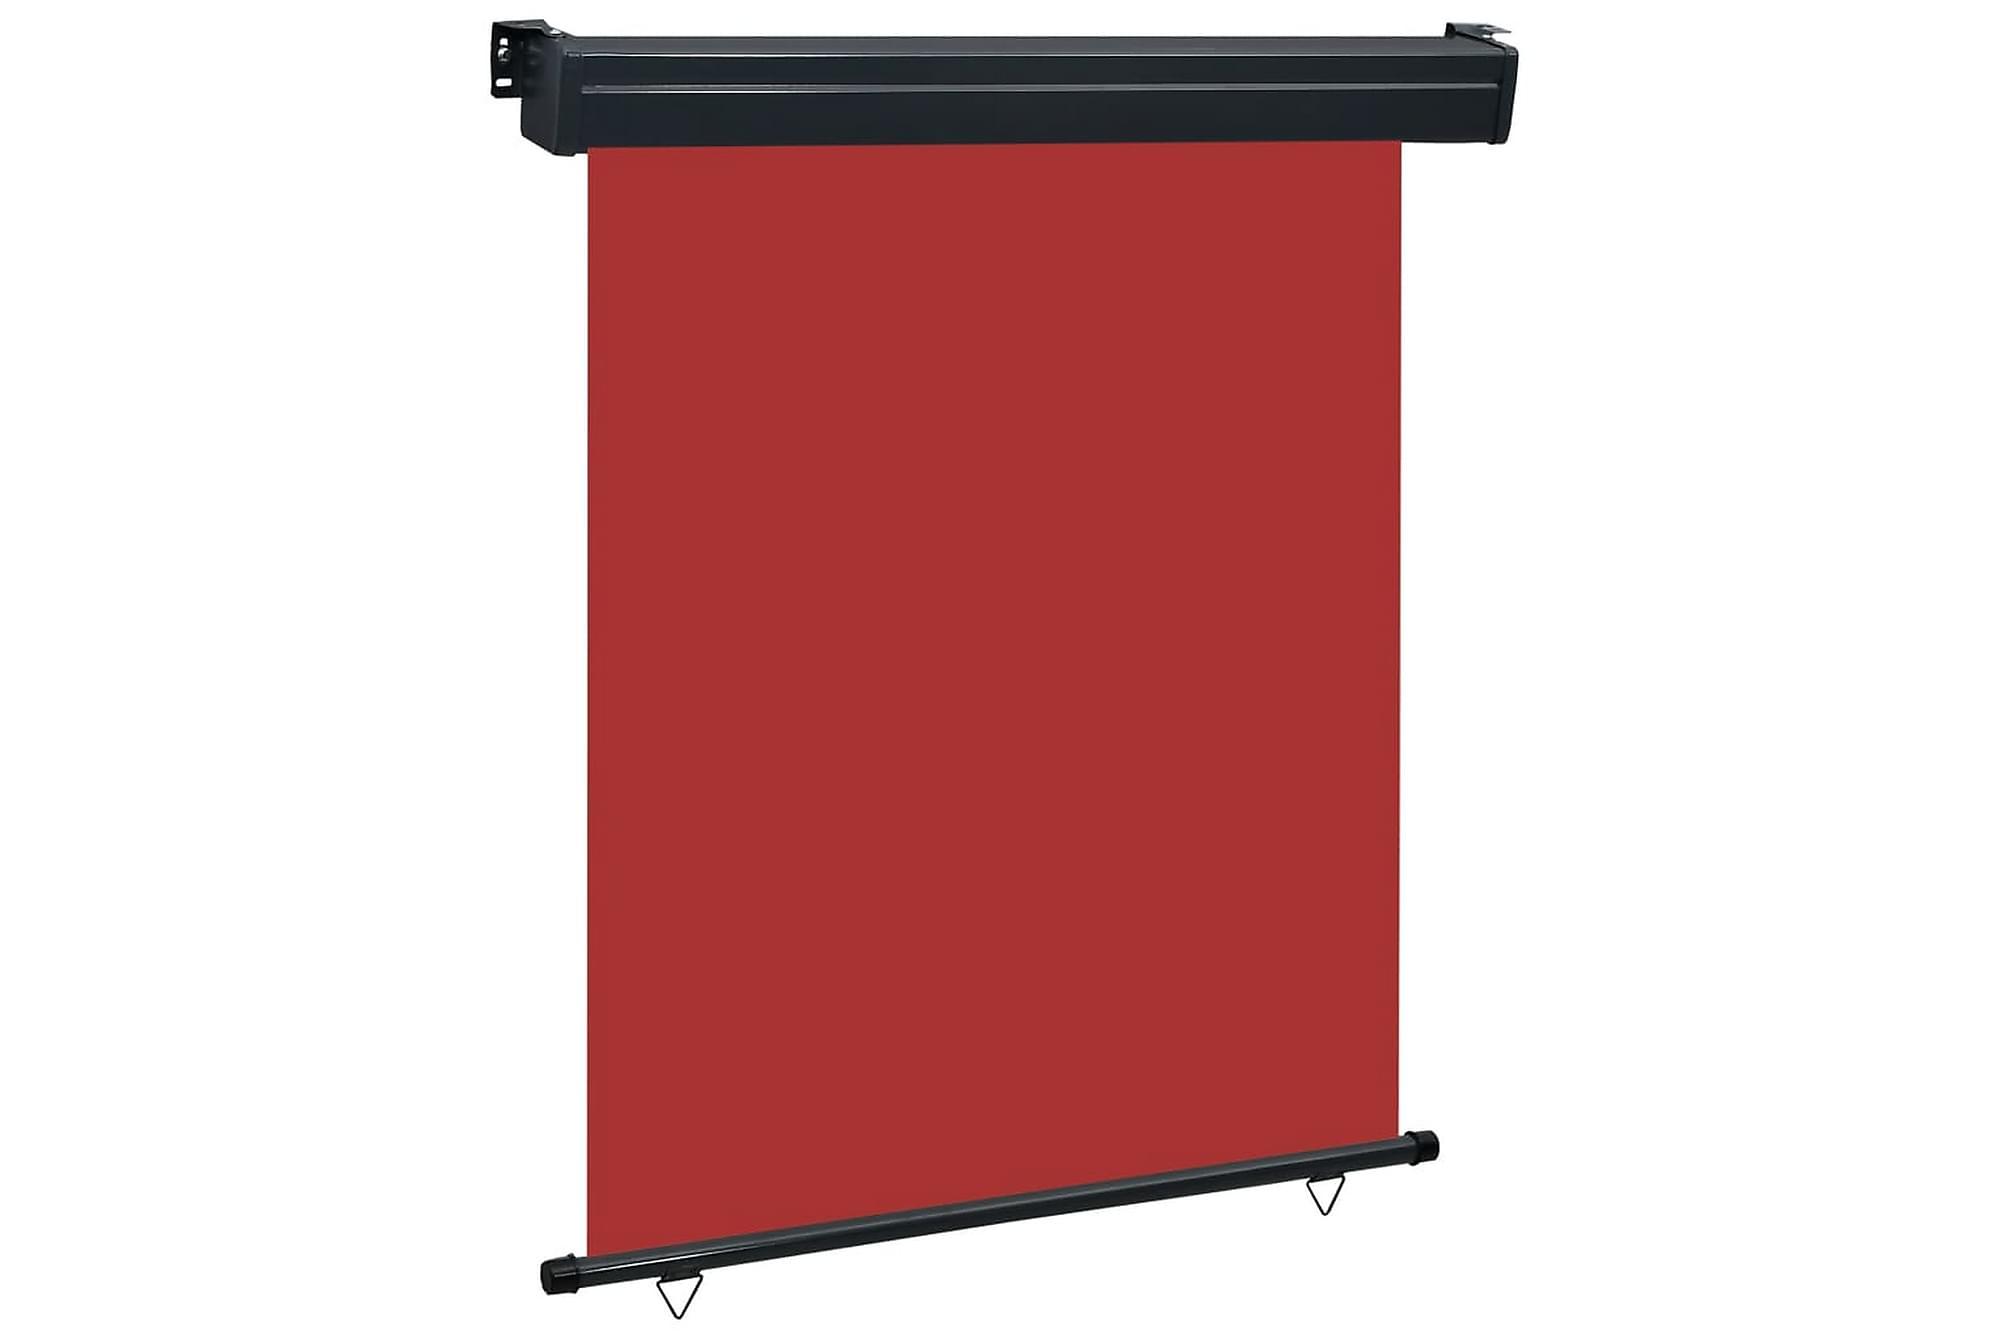 Balkongmarkis 140x250 cm röd, Markiser